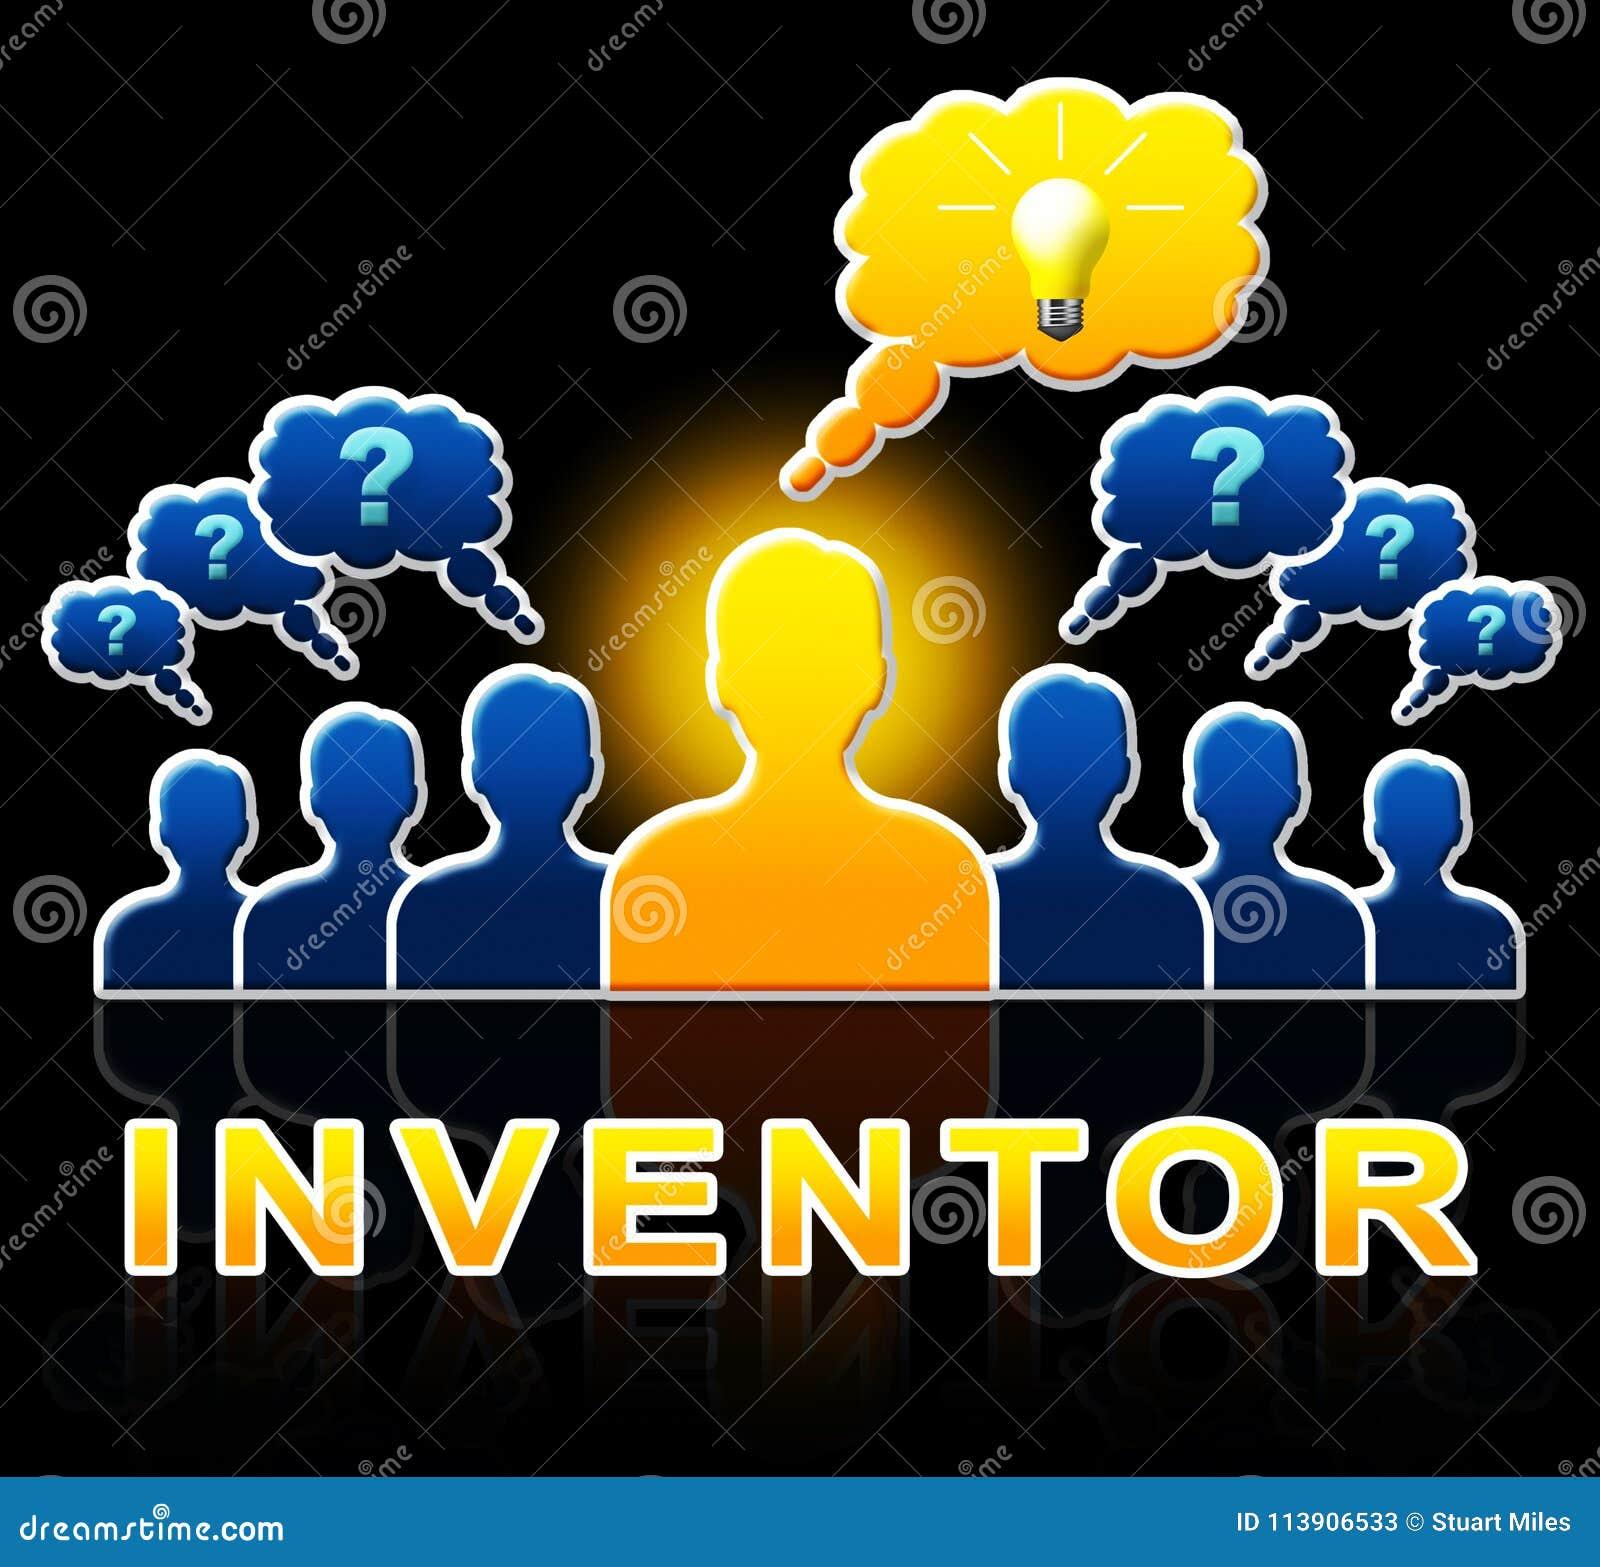 De uitvinder People Means Innovating vindt 3d Illustratie uit